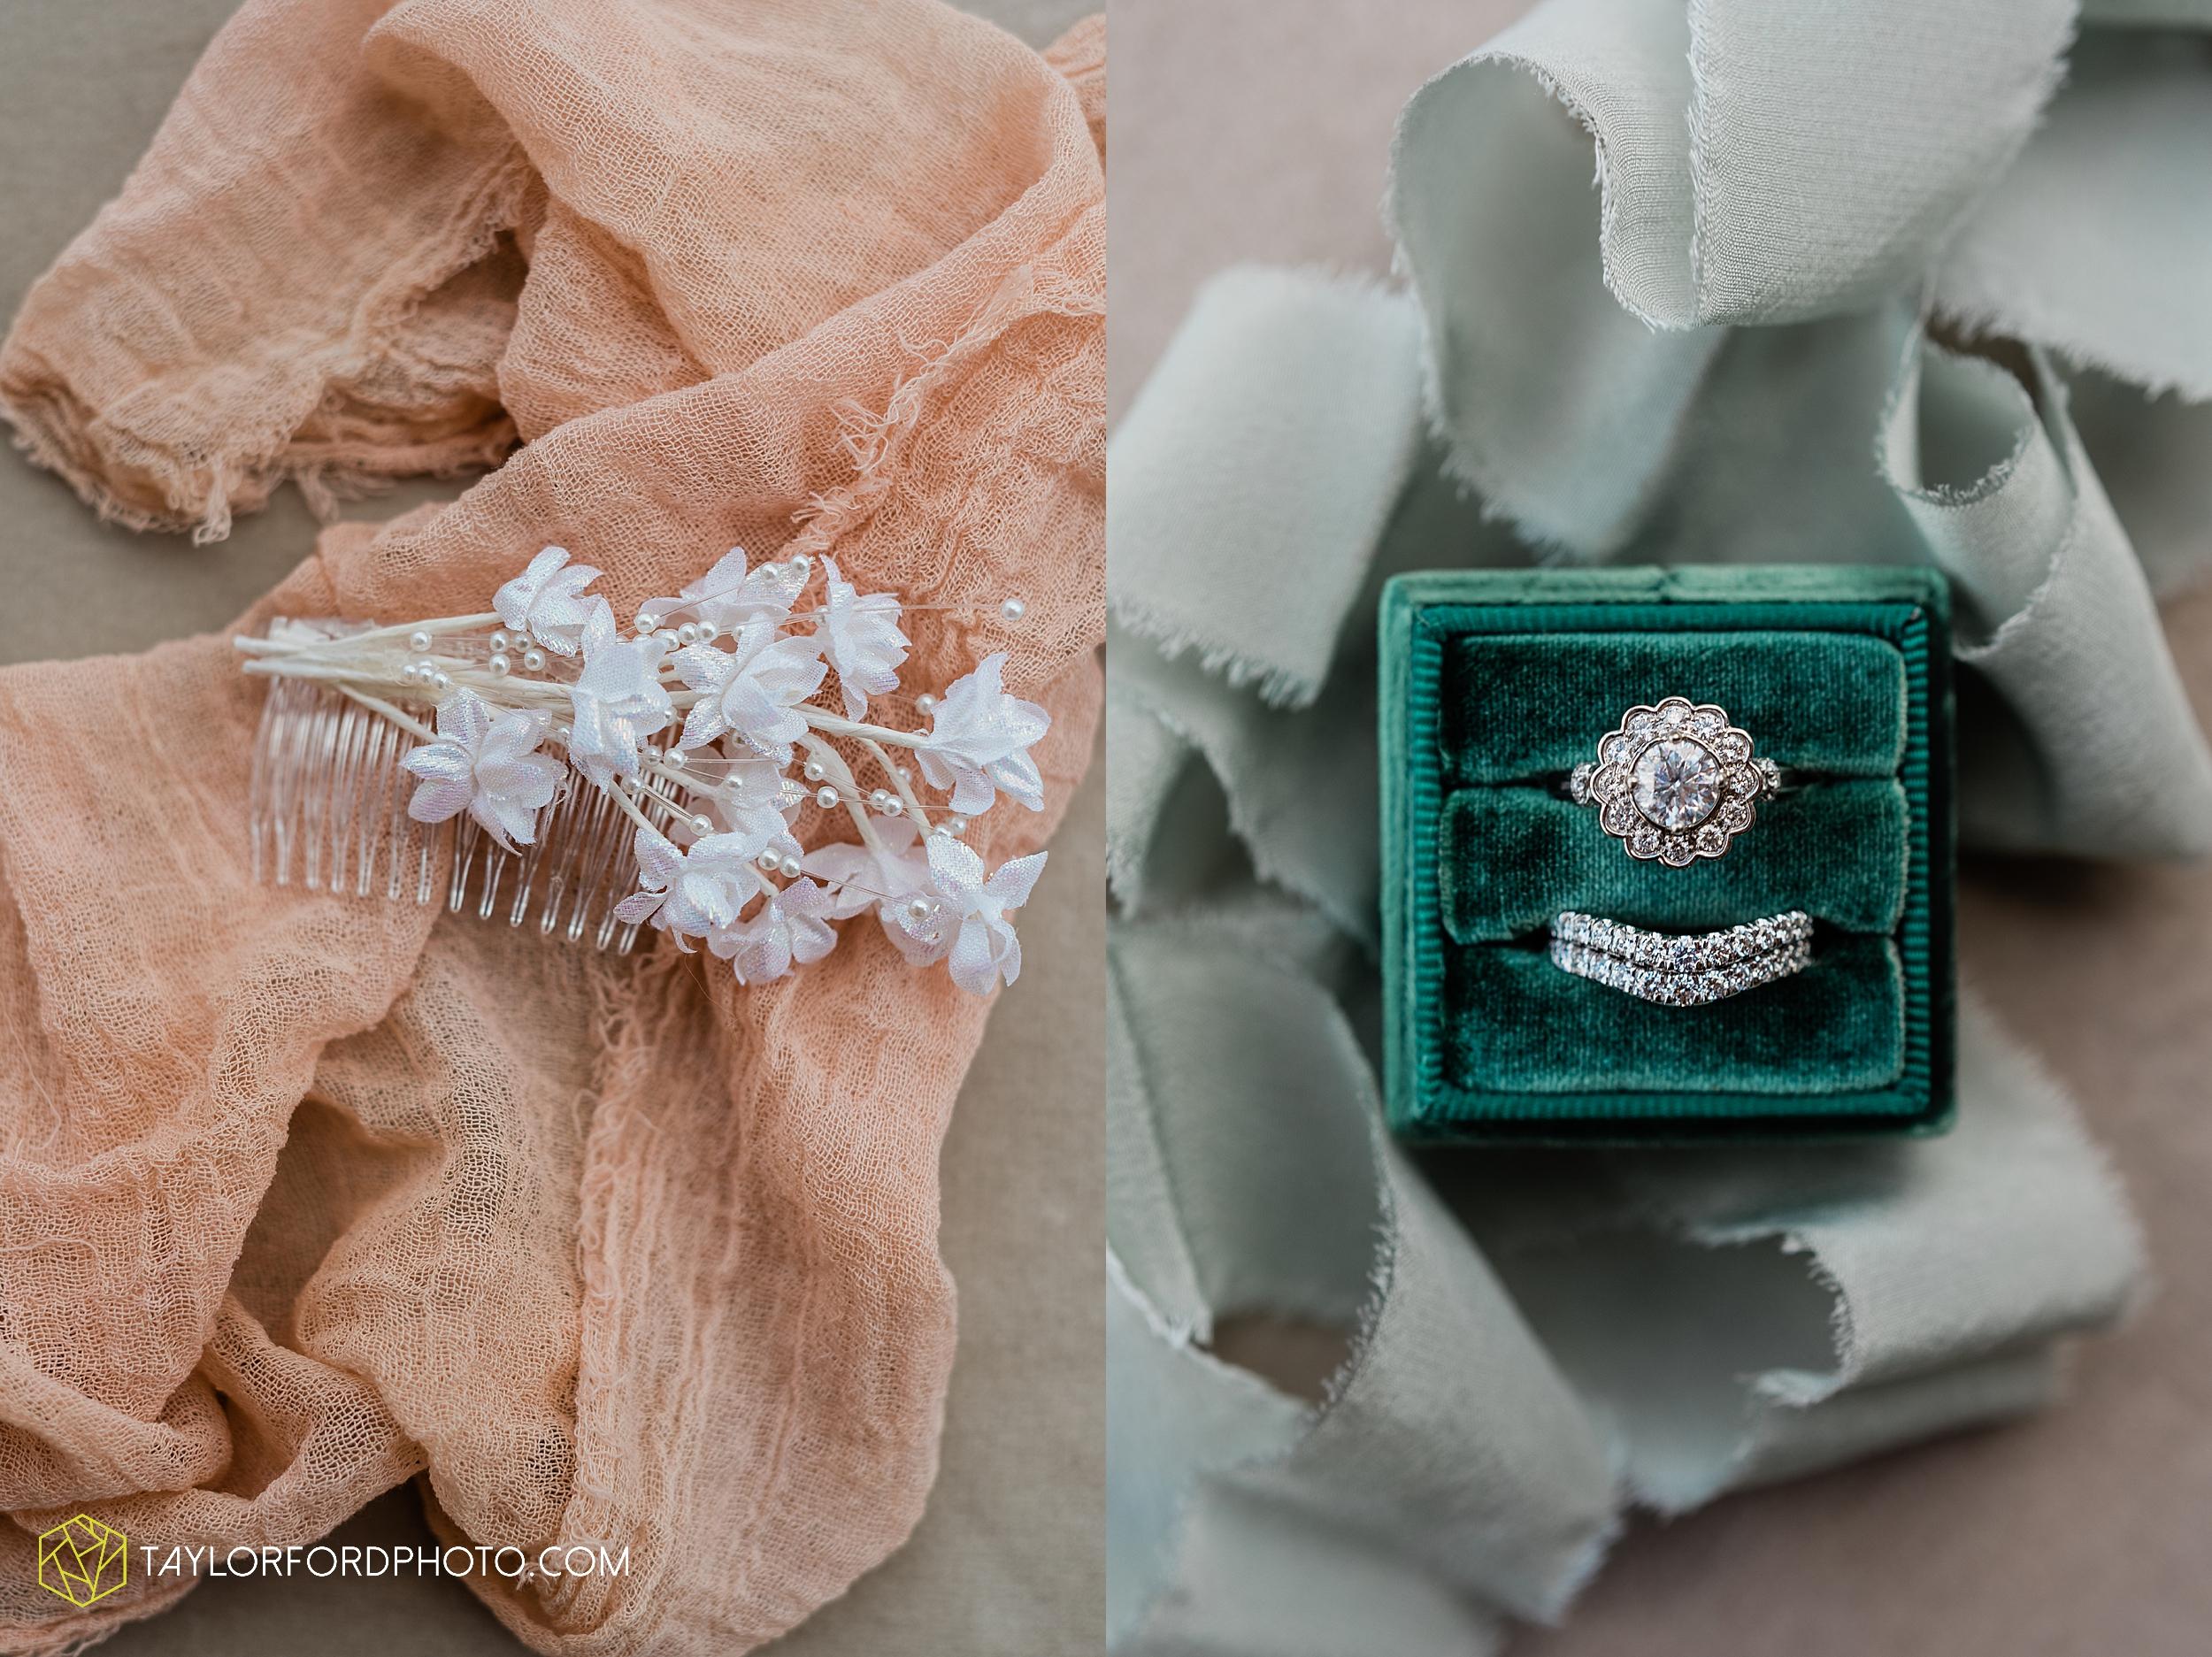 marissa-nicole-nick-daeger-orrmont-estate-farm-wedding-piqua-dayton-troy-ohio-fall-photographer-taylor-ford-photography_1500.jpg